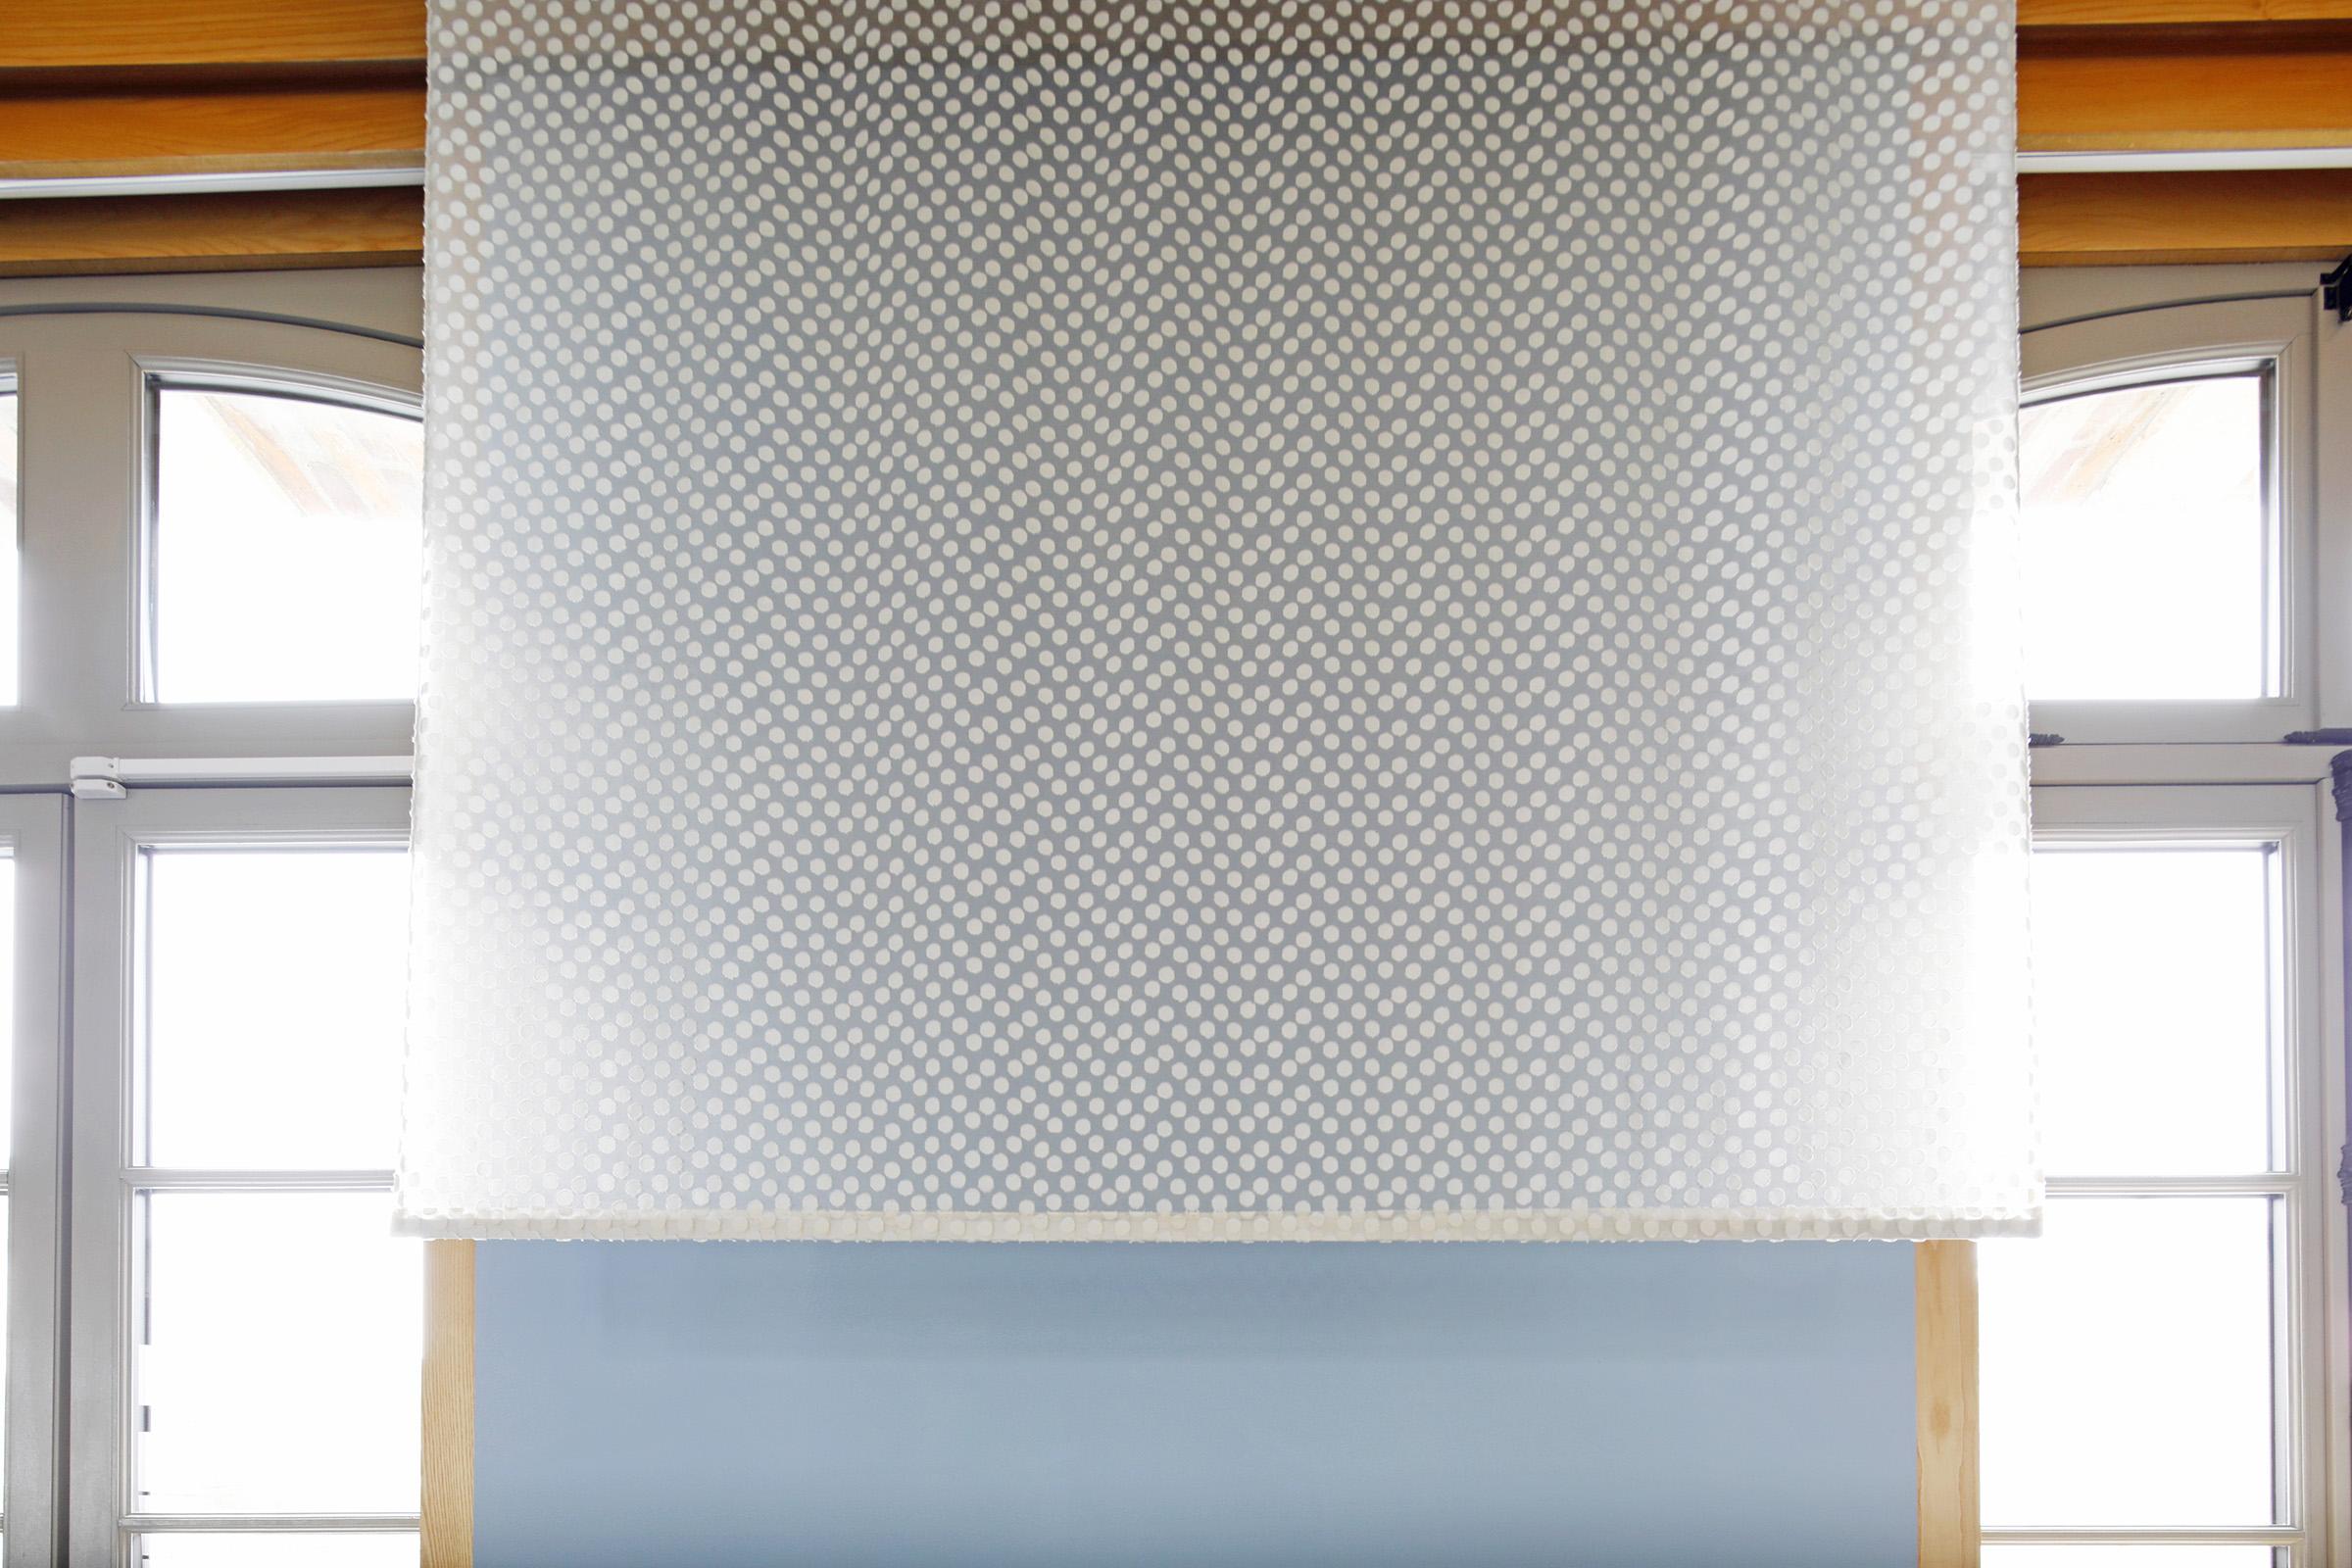 Amilly - La Maison Saint Loup - Interieur - Sylvain Dubuisson 024.jpg